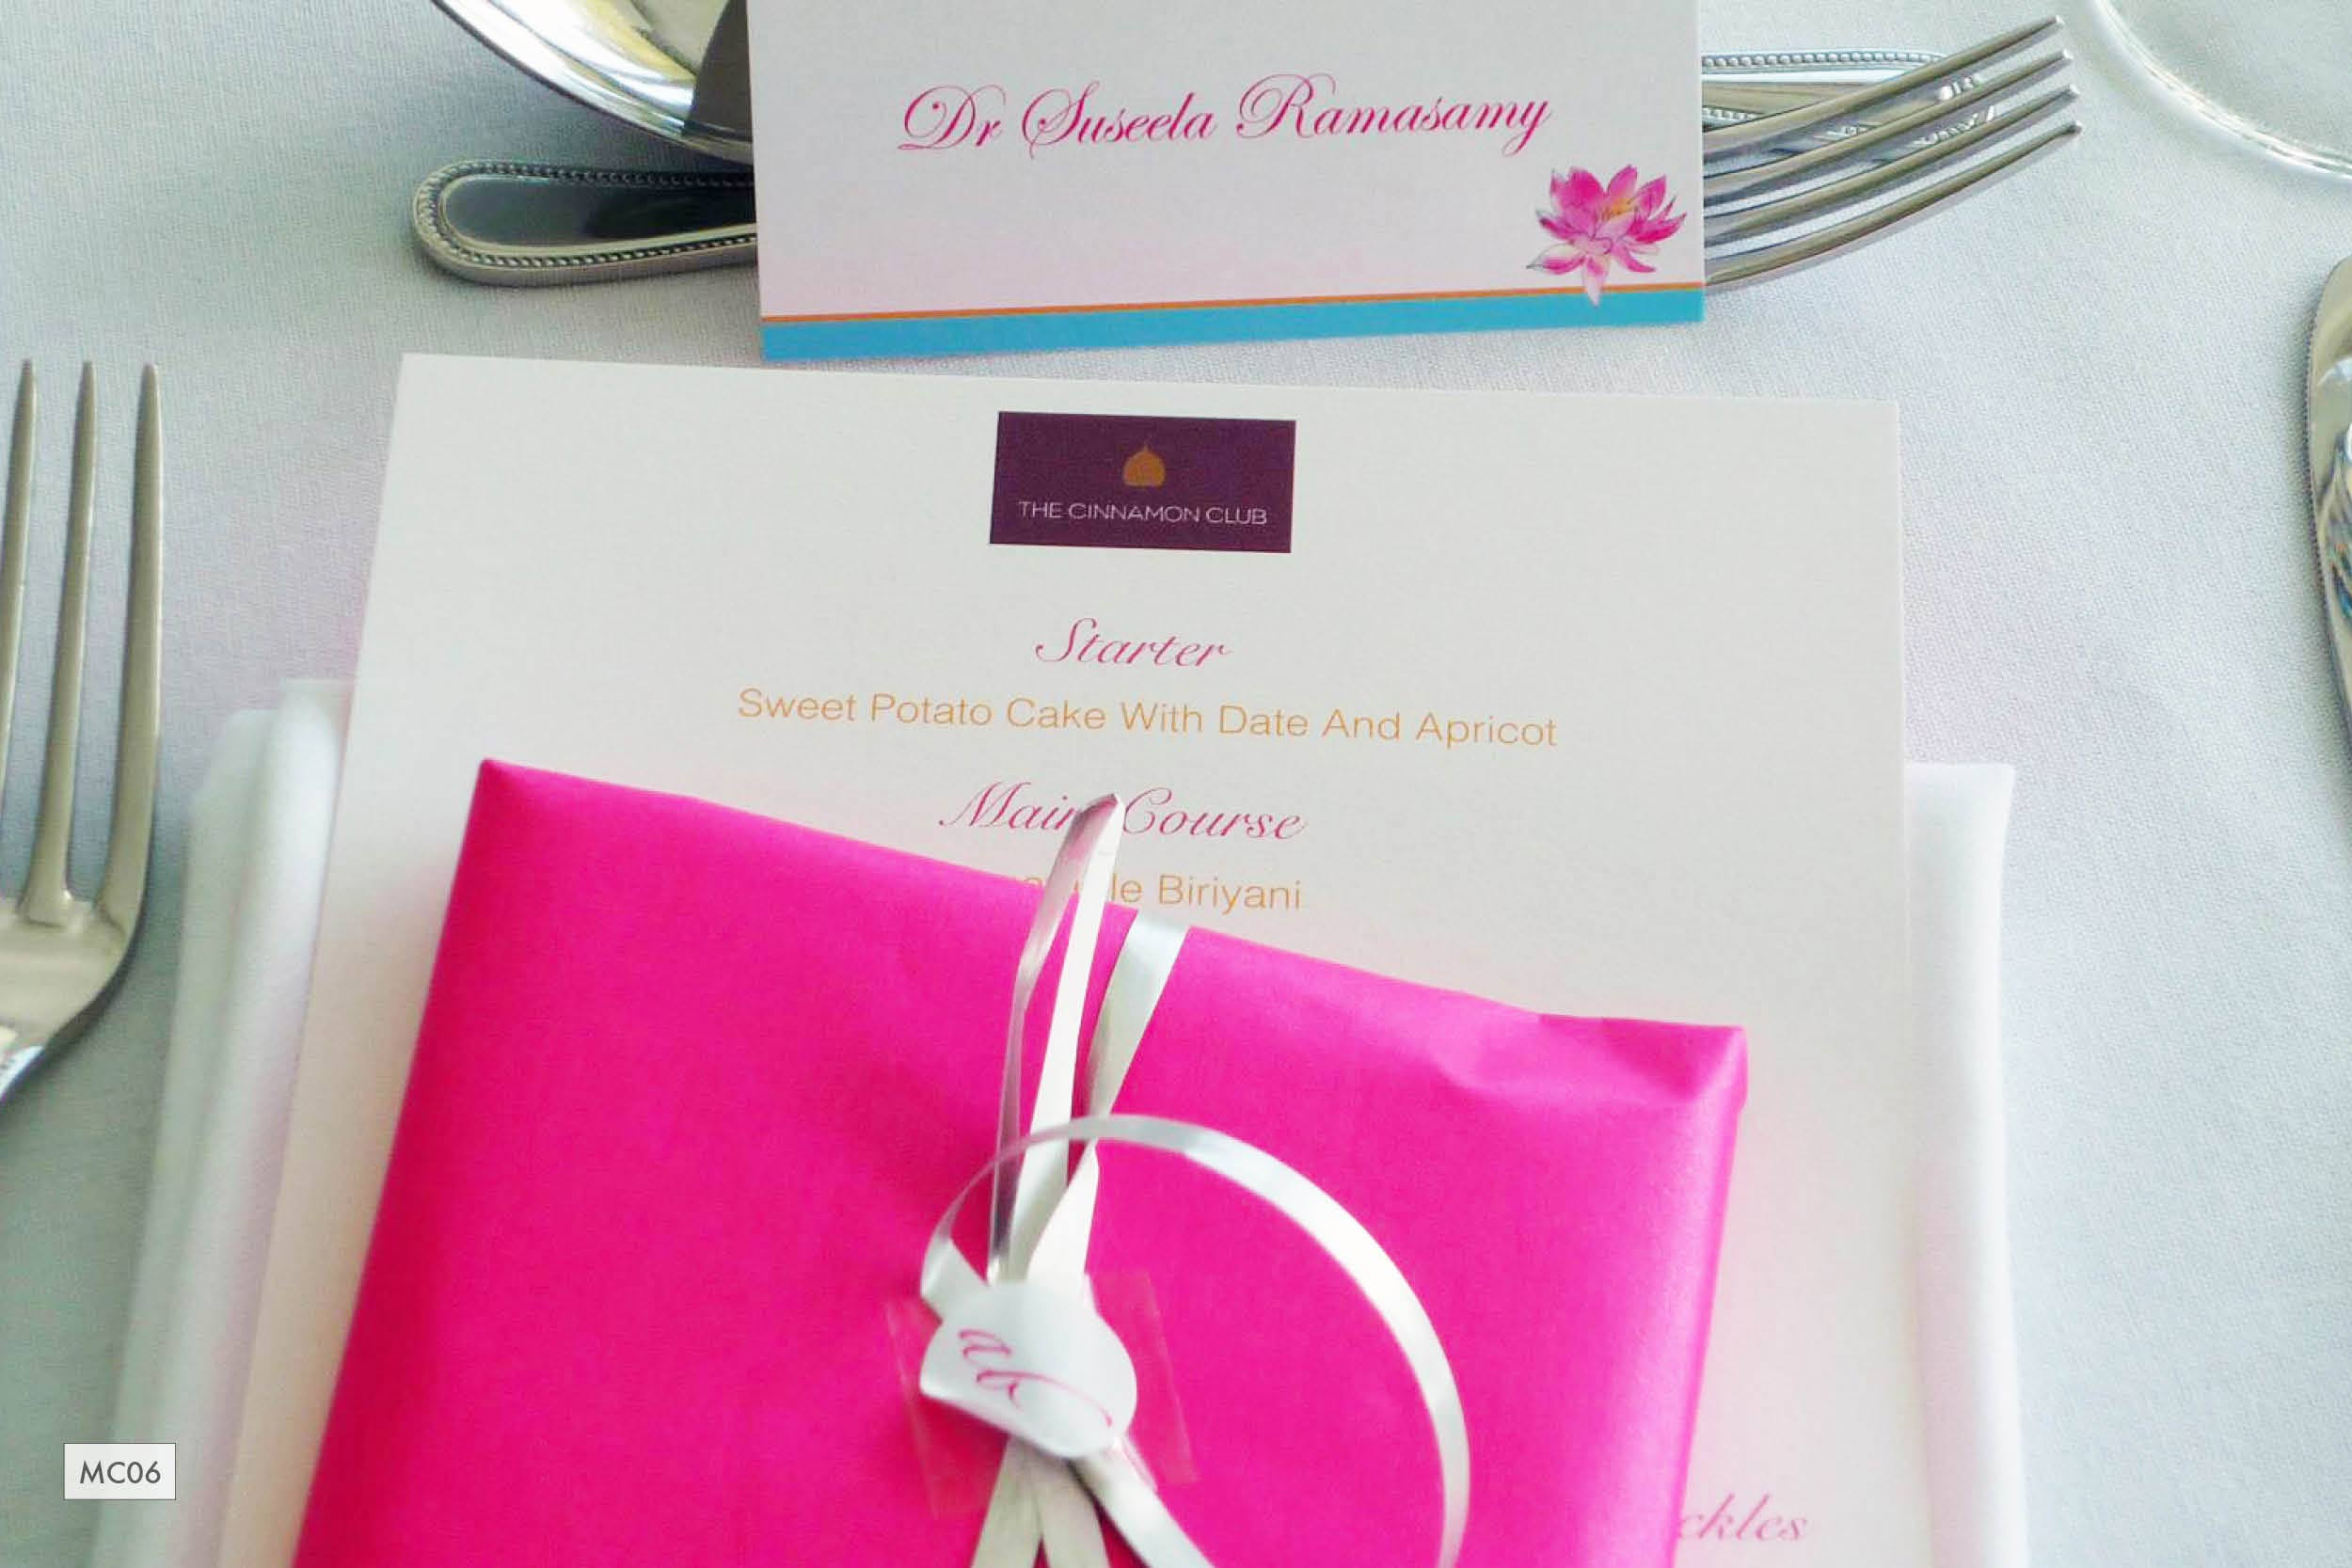 Floral-pink-lotus-English-Indian-multicultural-wedding-place-card-menu_ananyacards.com.jpg